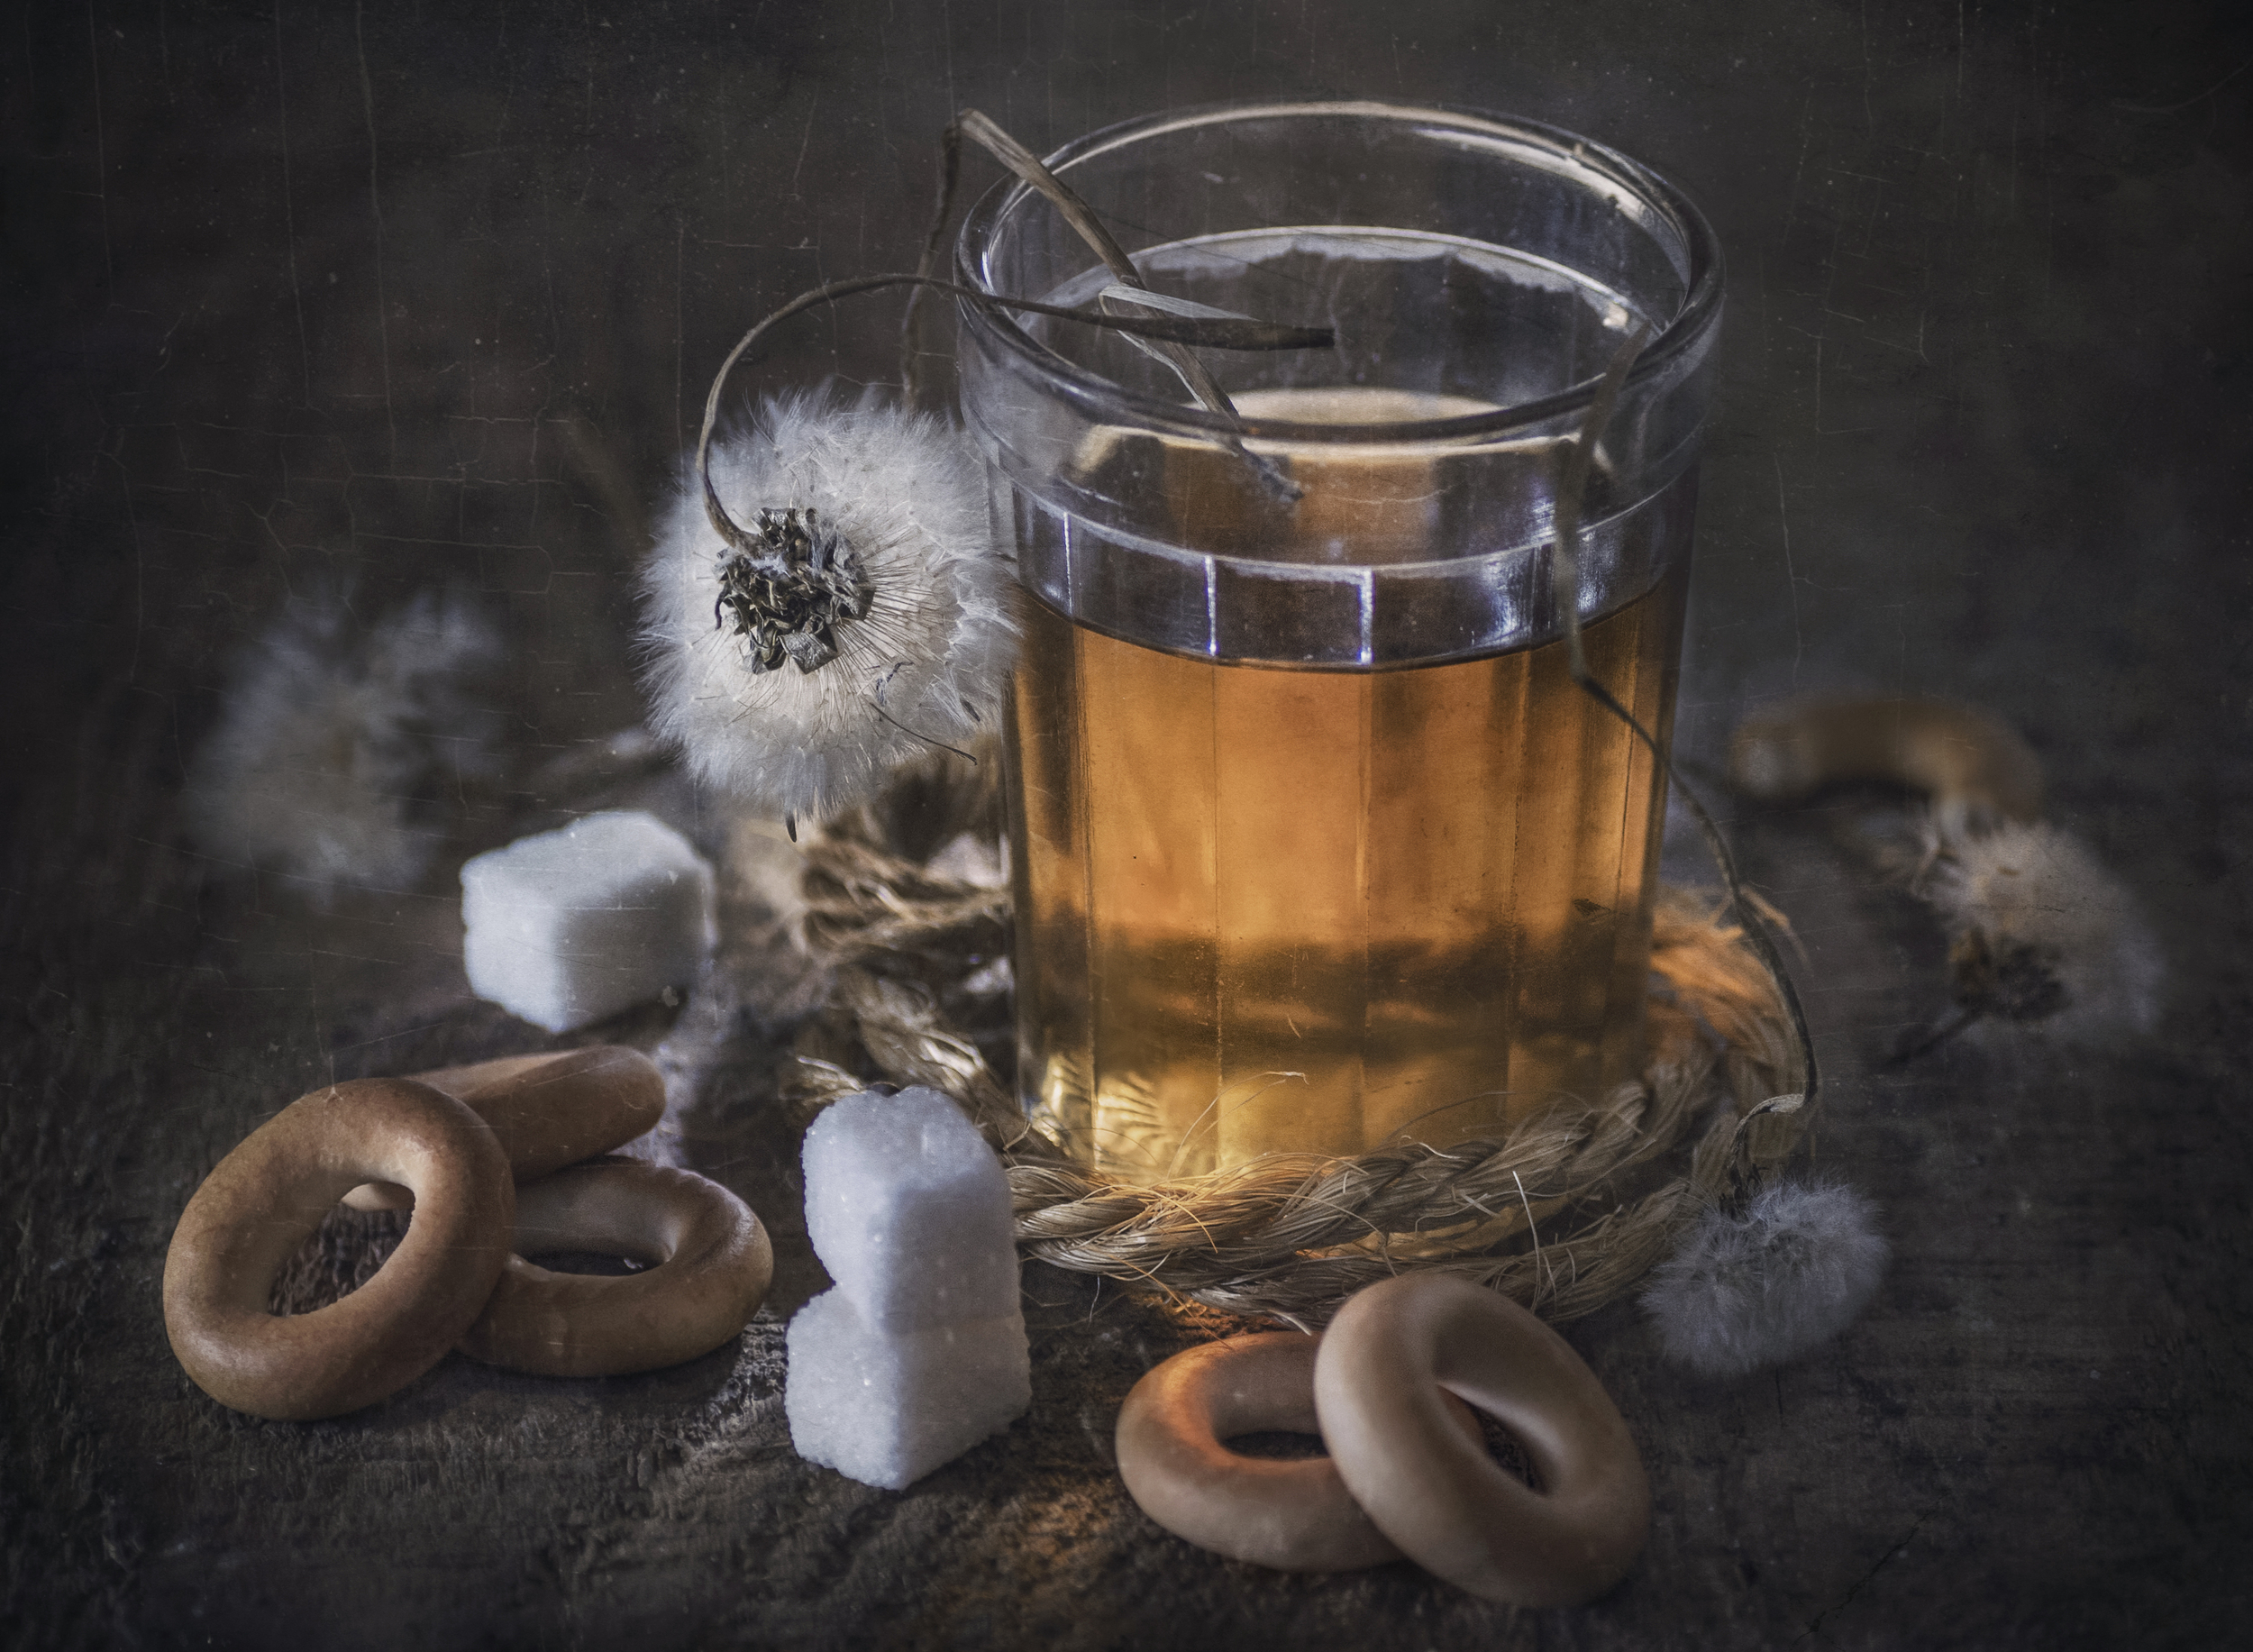 чай,сушки,старый,стакан,тепло,сахар,одуванчики, Володин Владимир